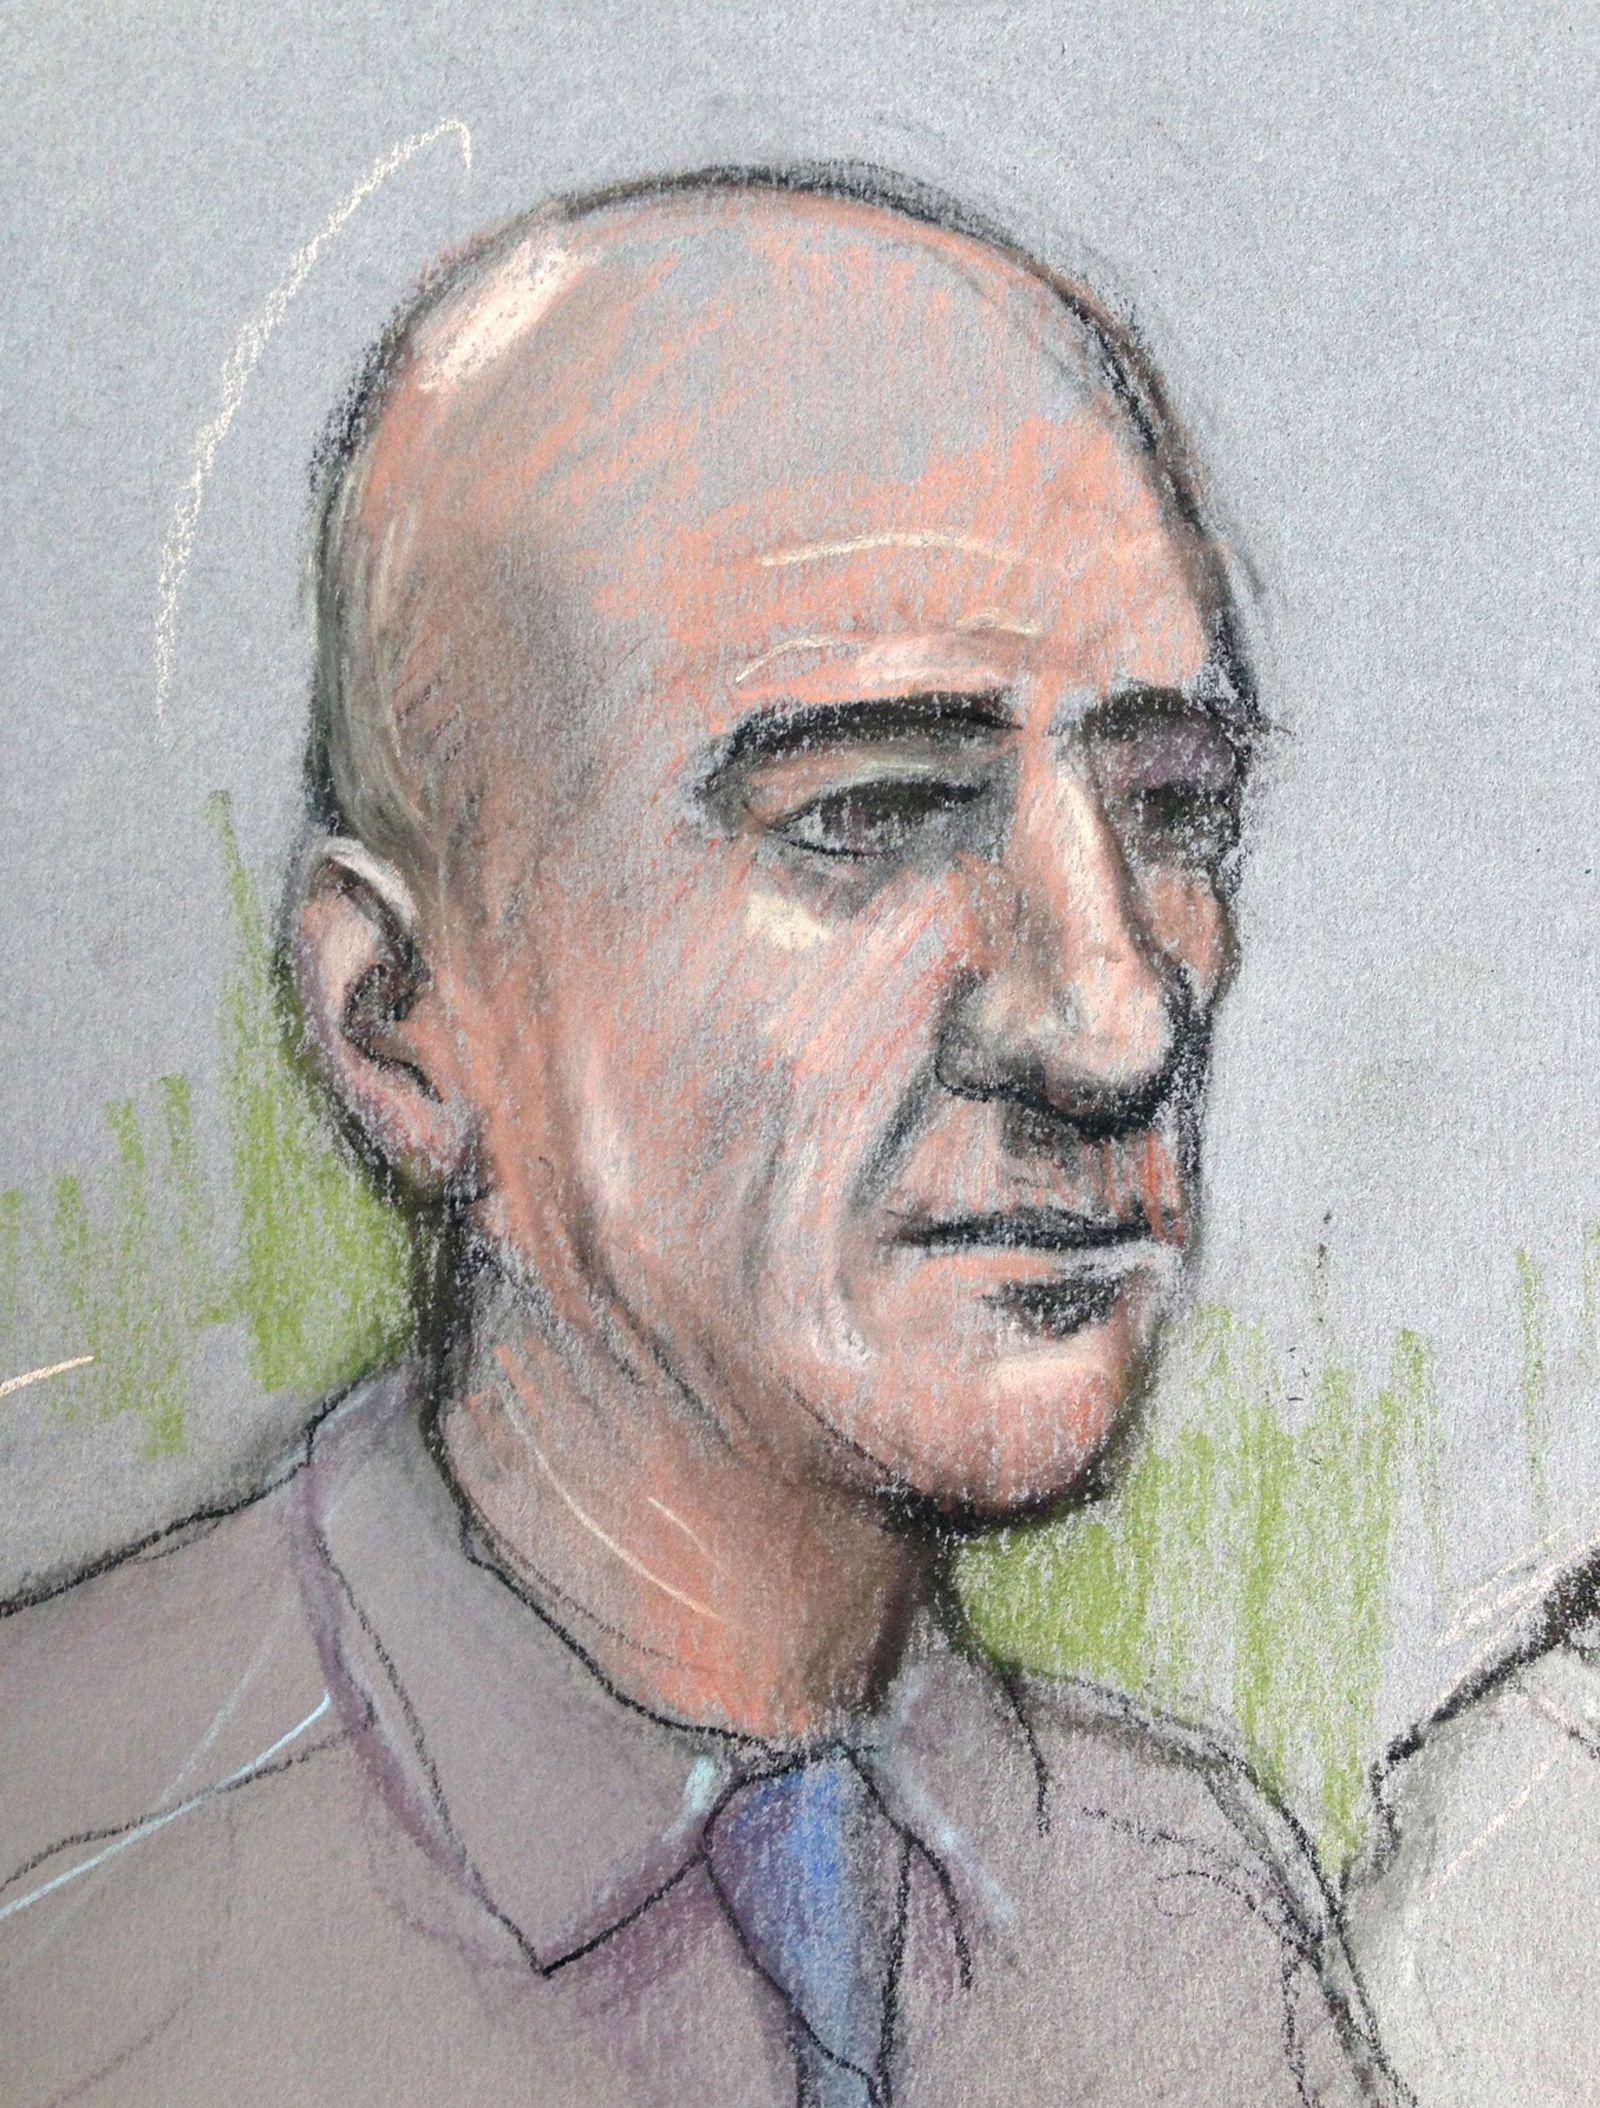 Stephen Port/ Britain Serial Killer